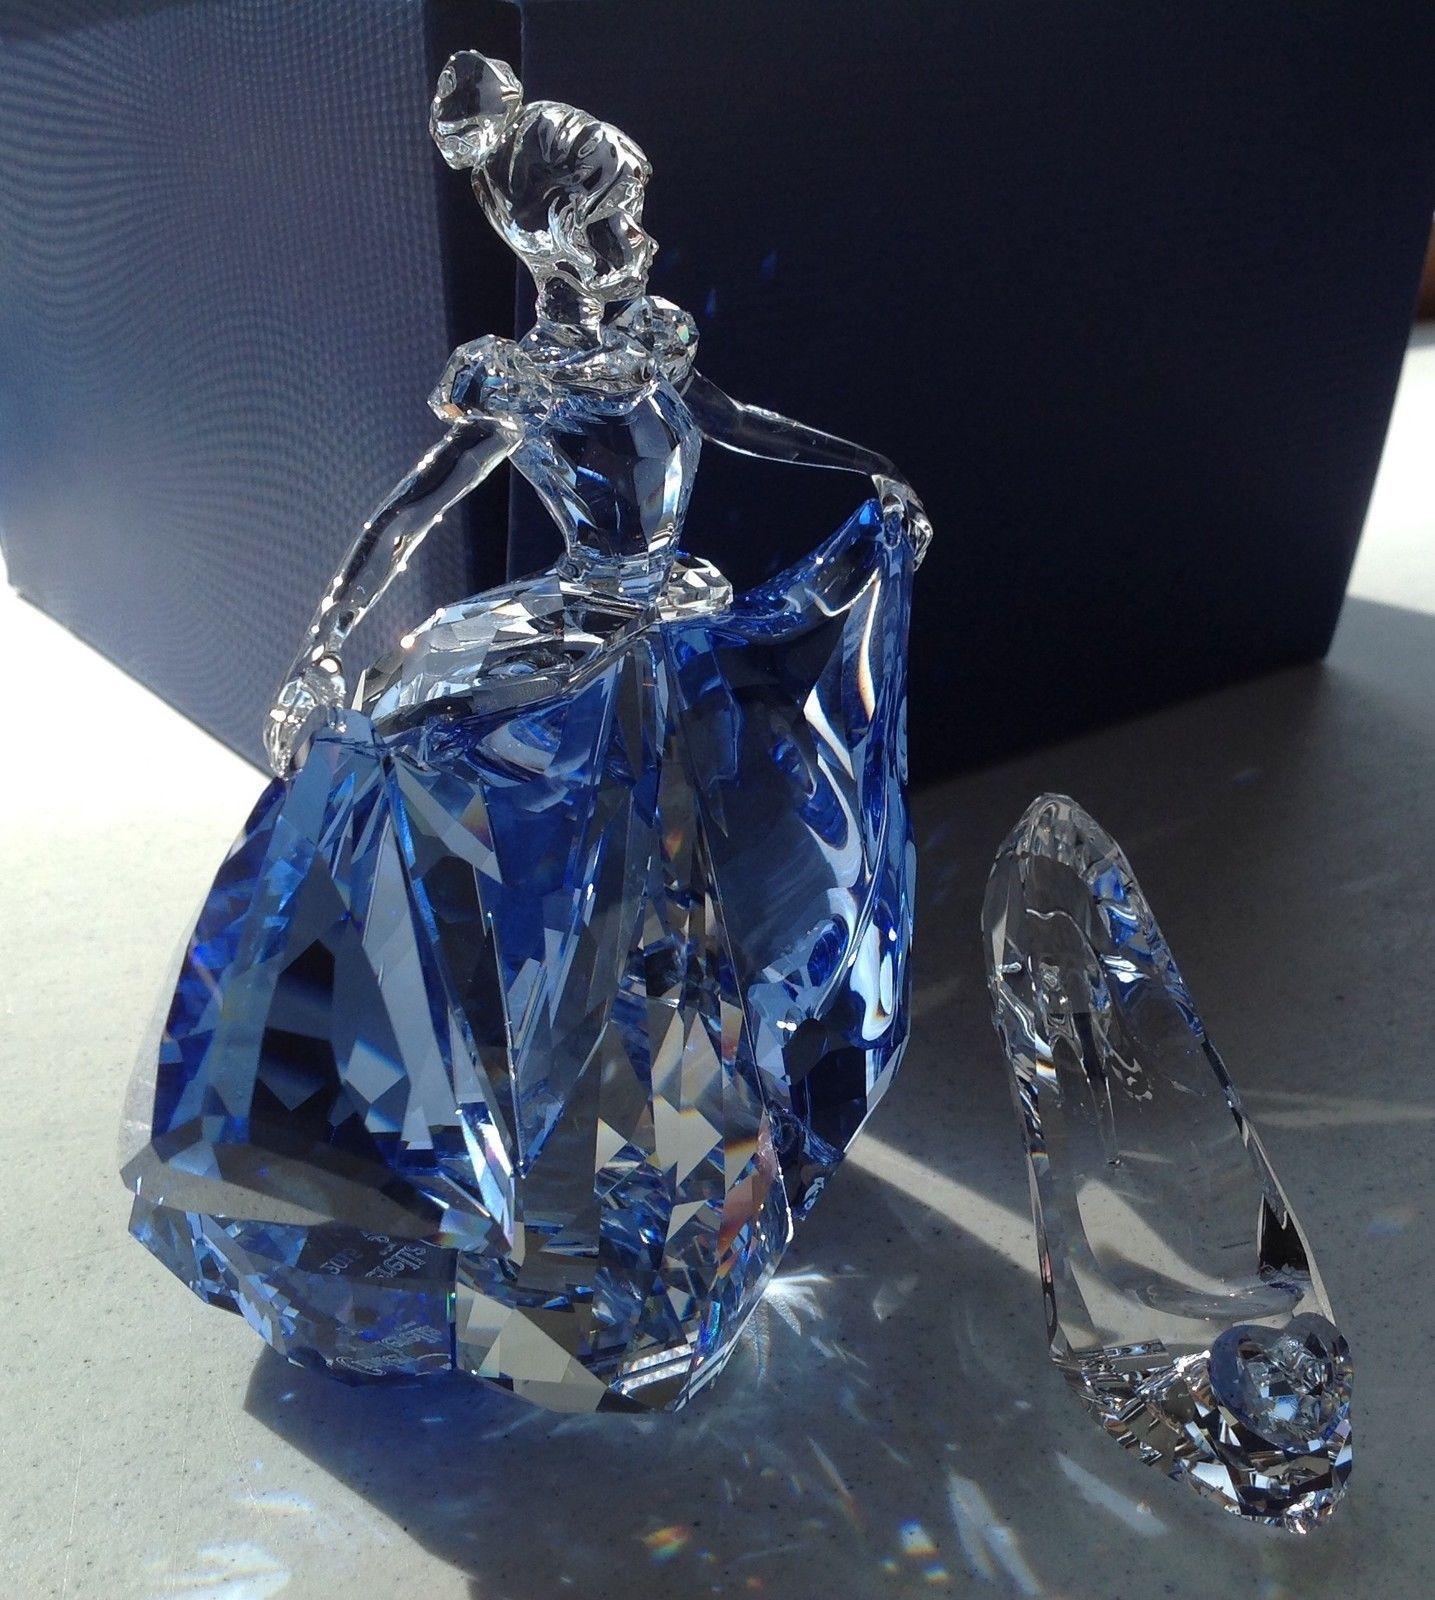 893a8251f641 Swarovski Crystal Figurine Brand New 2015 Cinderella Slipper